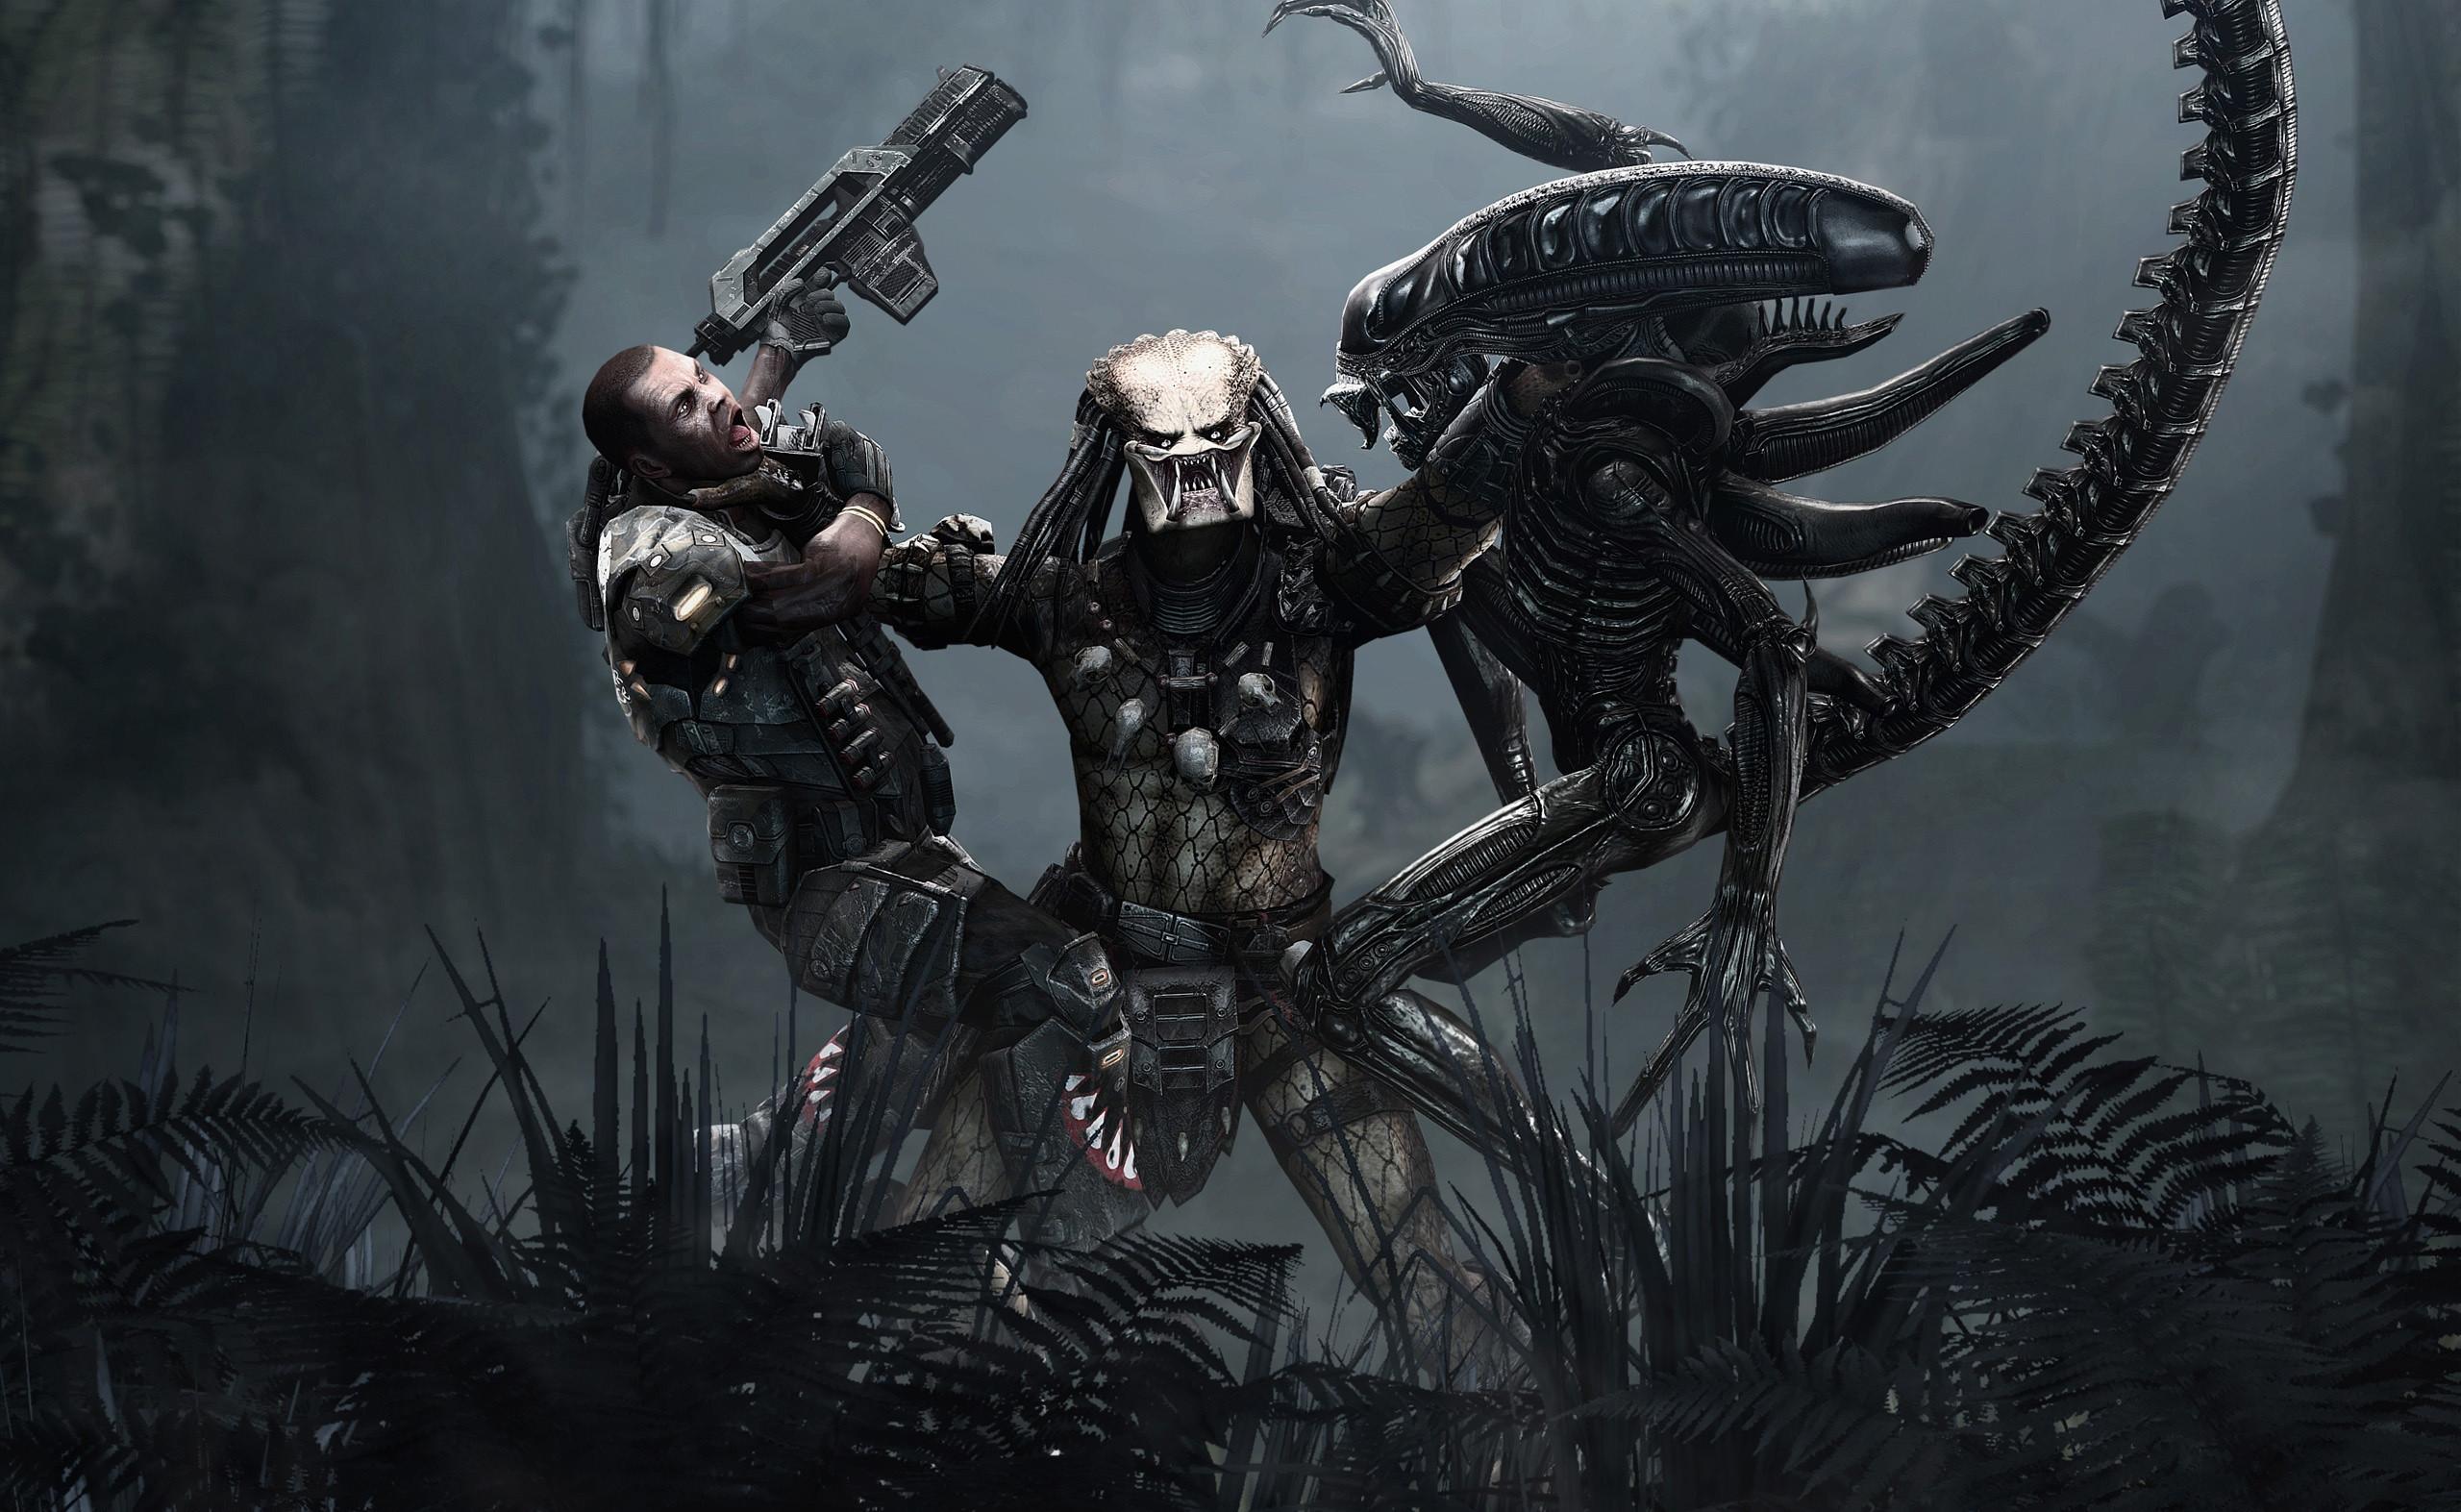 27 Aliens Vs. Predator HD Wallpapers   Backgrounds – Wallpaper Abyss